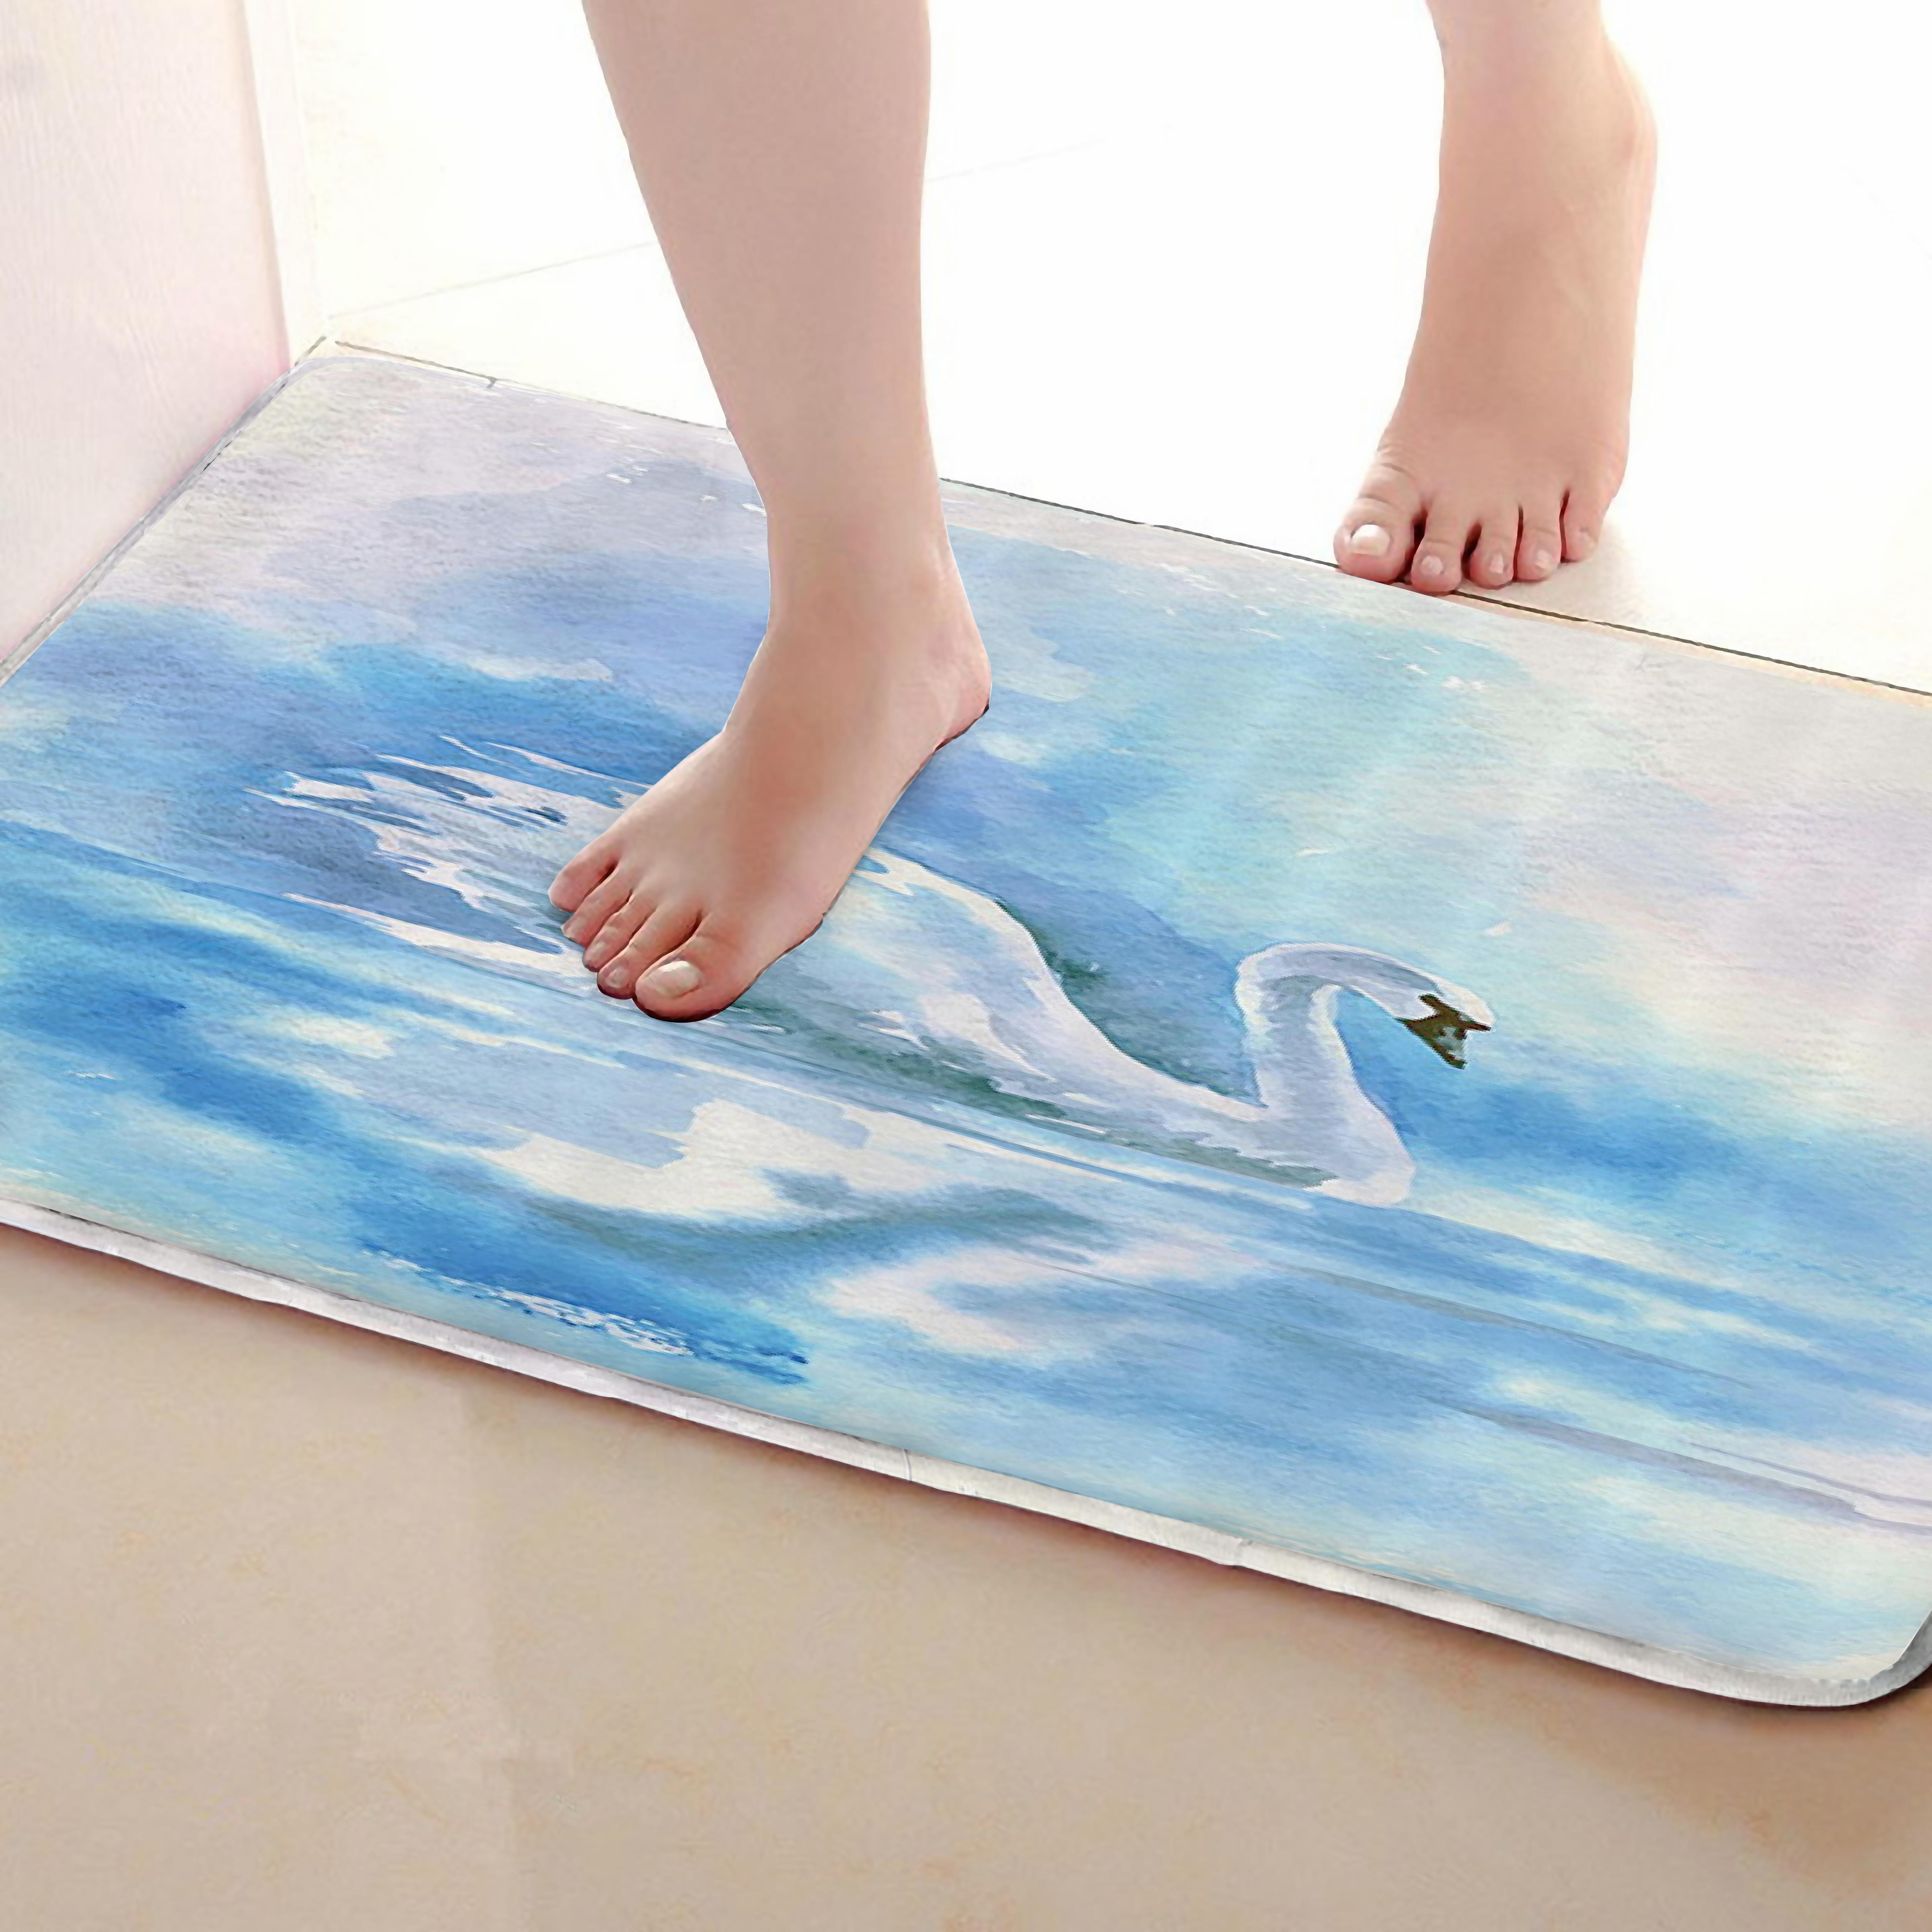 Swan Style Bathroom Mat,Funny Anti Skid Bath Mat,Shower Curtains ...